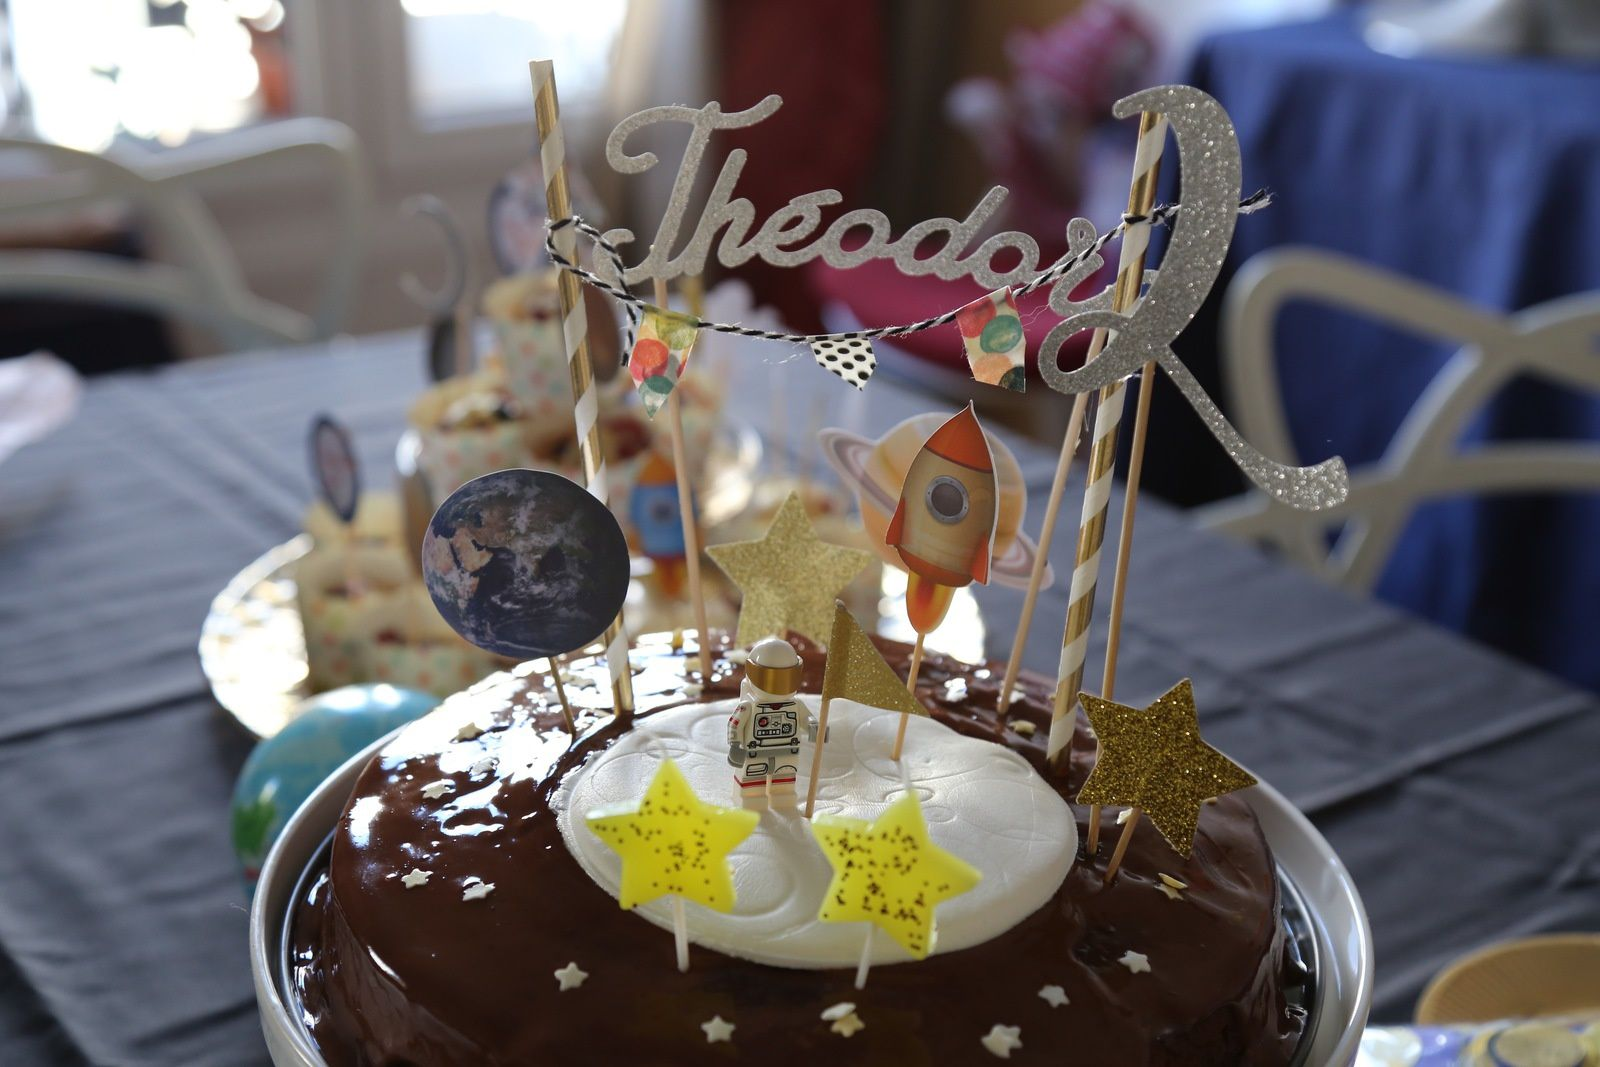 Gâteau au chocolat de l'espace....